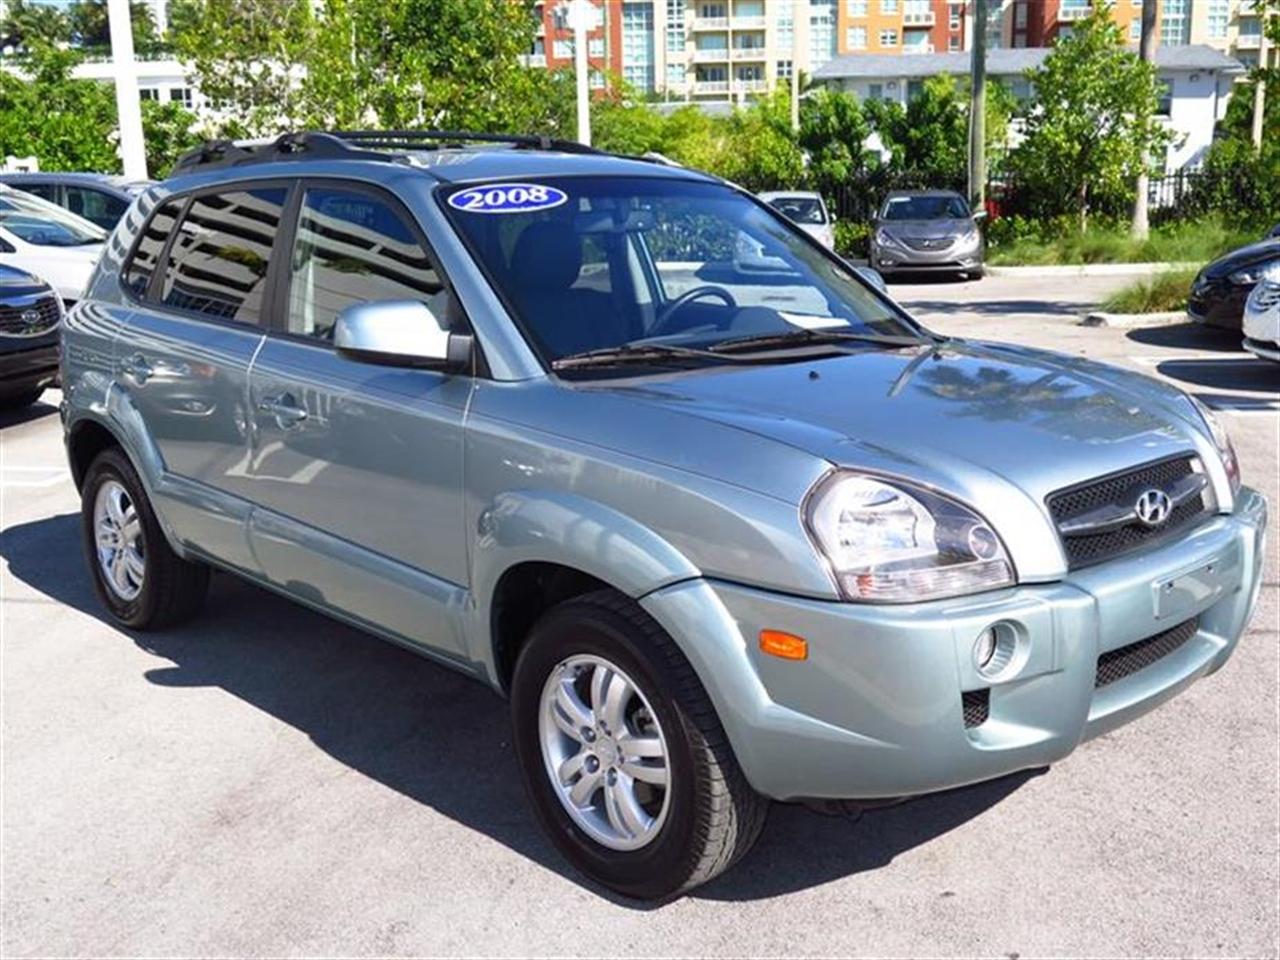 2008 HYUNDAI TUCSON FWD 4dr V6 Auto Limited Ltd Avail 9326 miles 2 coat hooks 3 assist grip